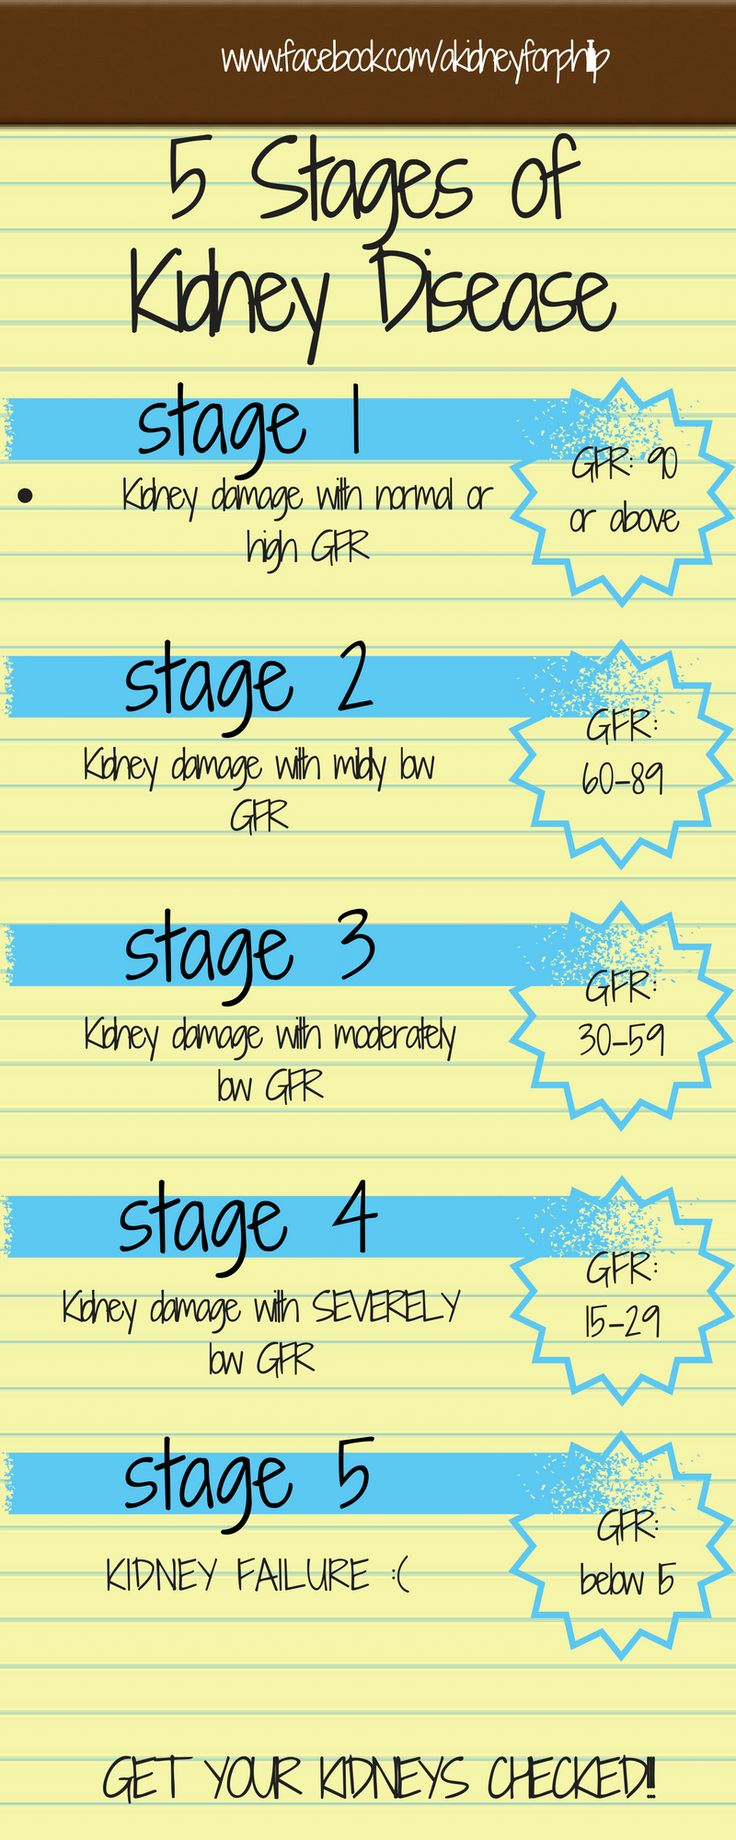 5 Stages of Kidney Disease Infographic www.facebook.com/akidneyforphillip